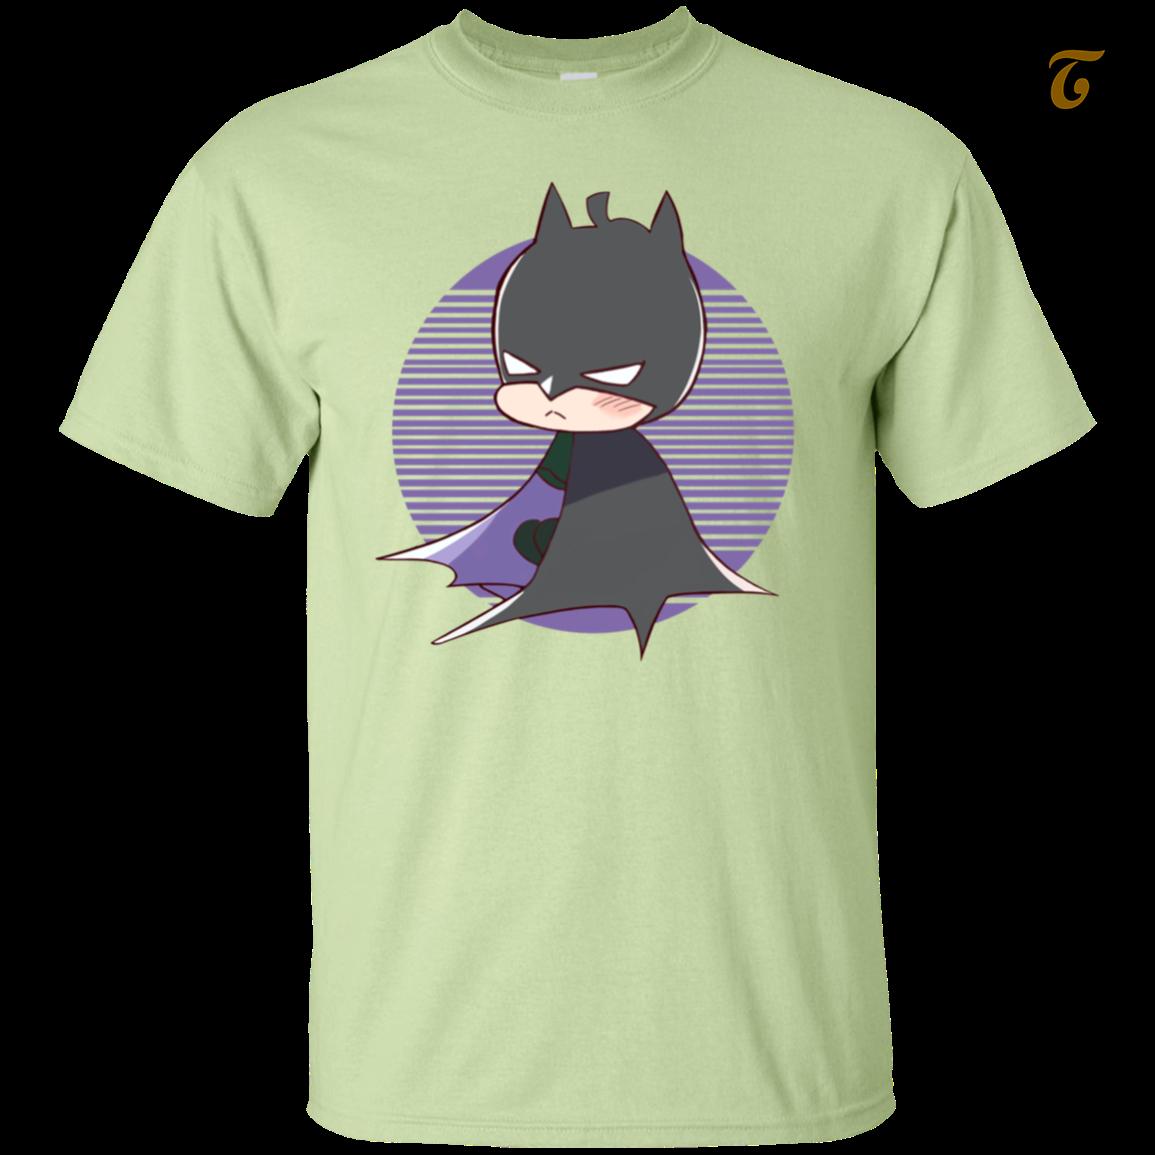 Batman, Supper Man, Comic, Film, Men's T-Shirt - Pistachio